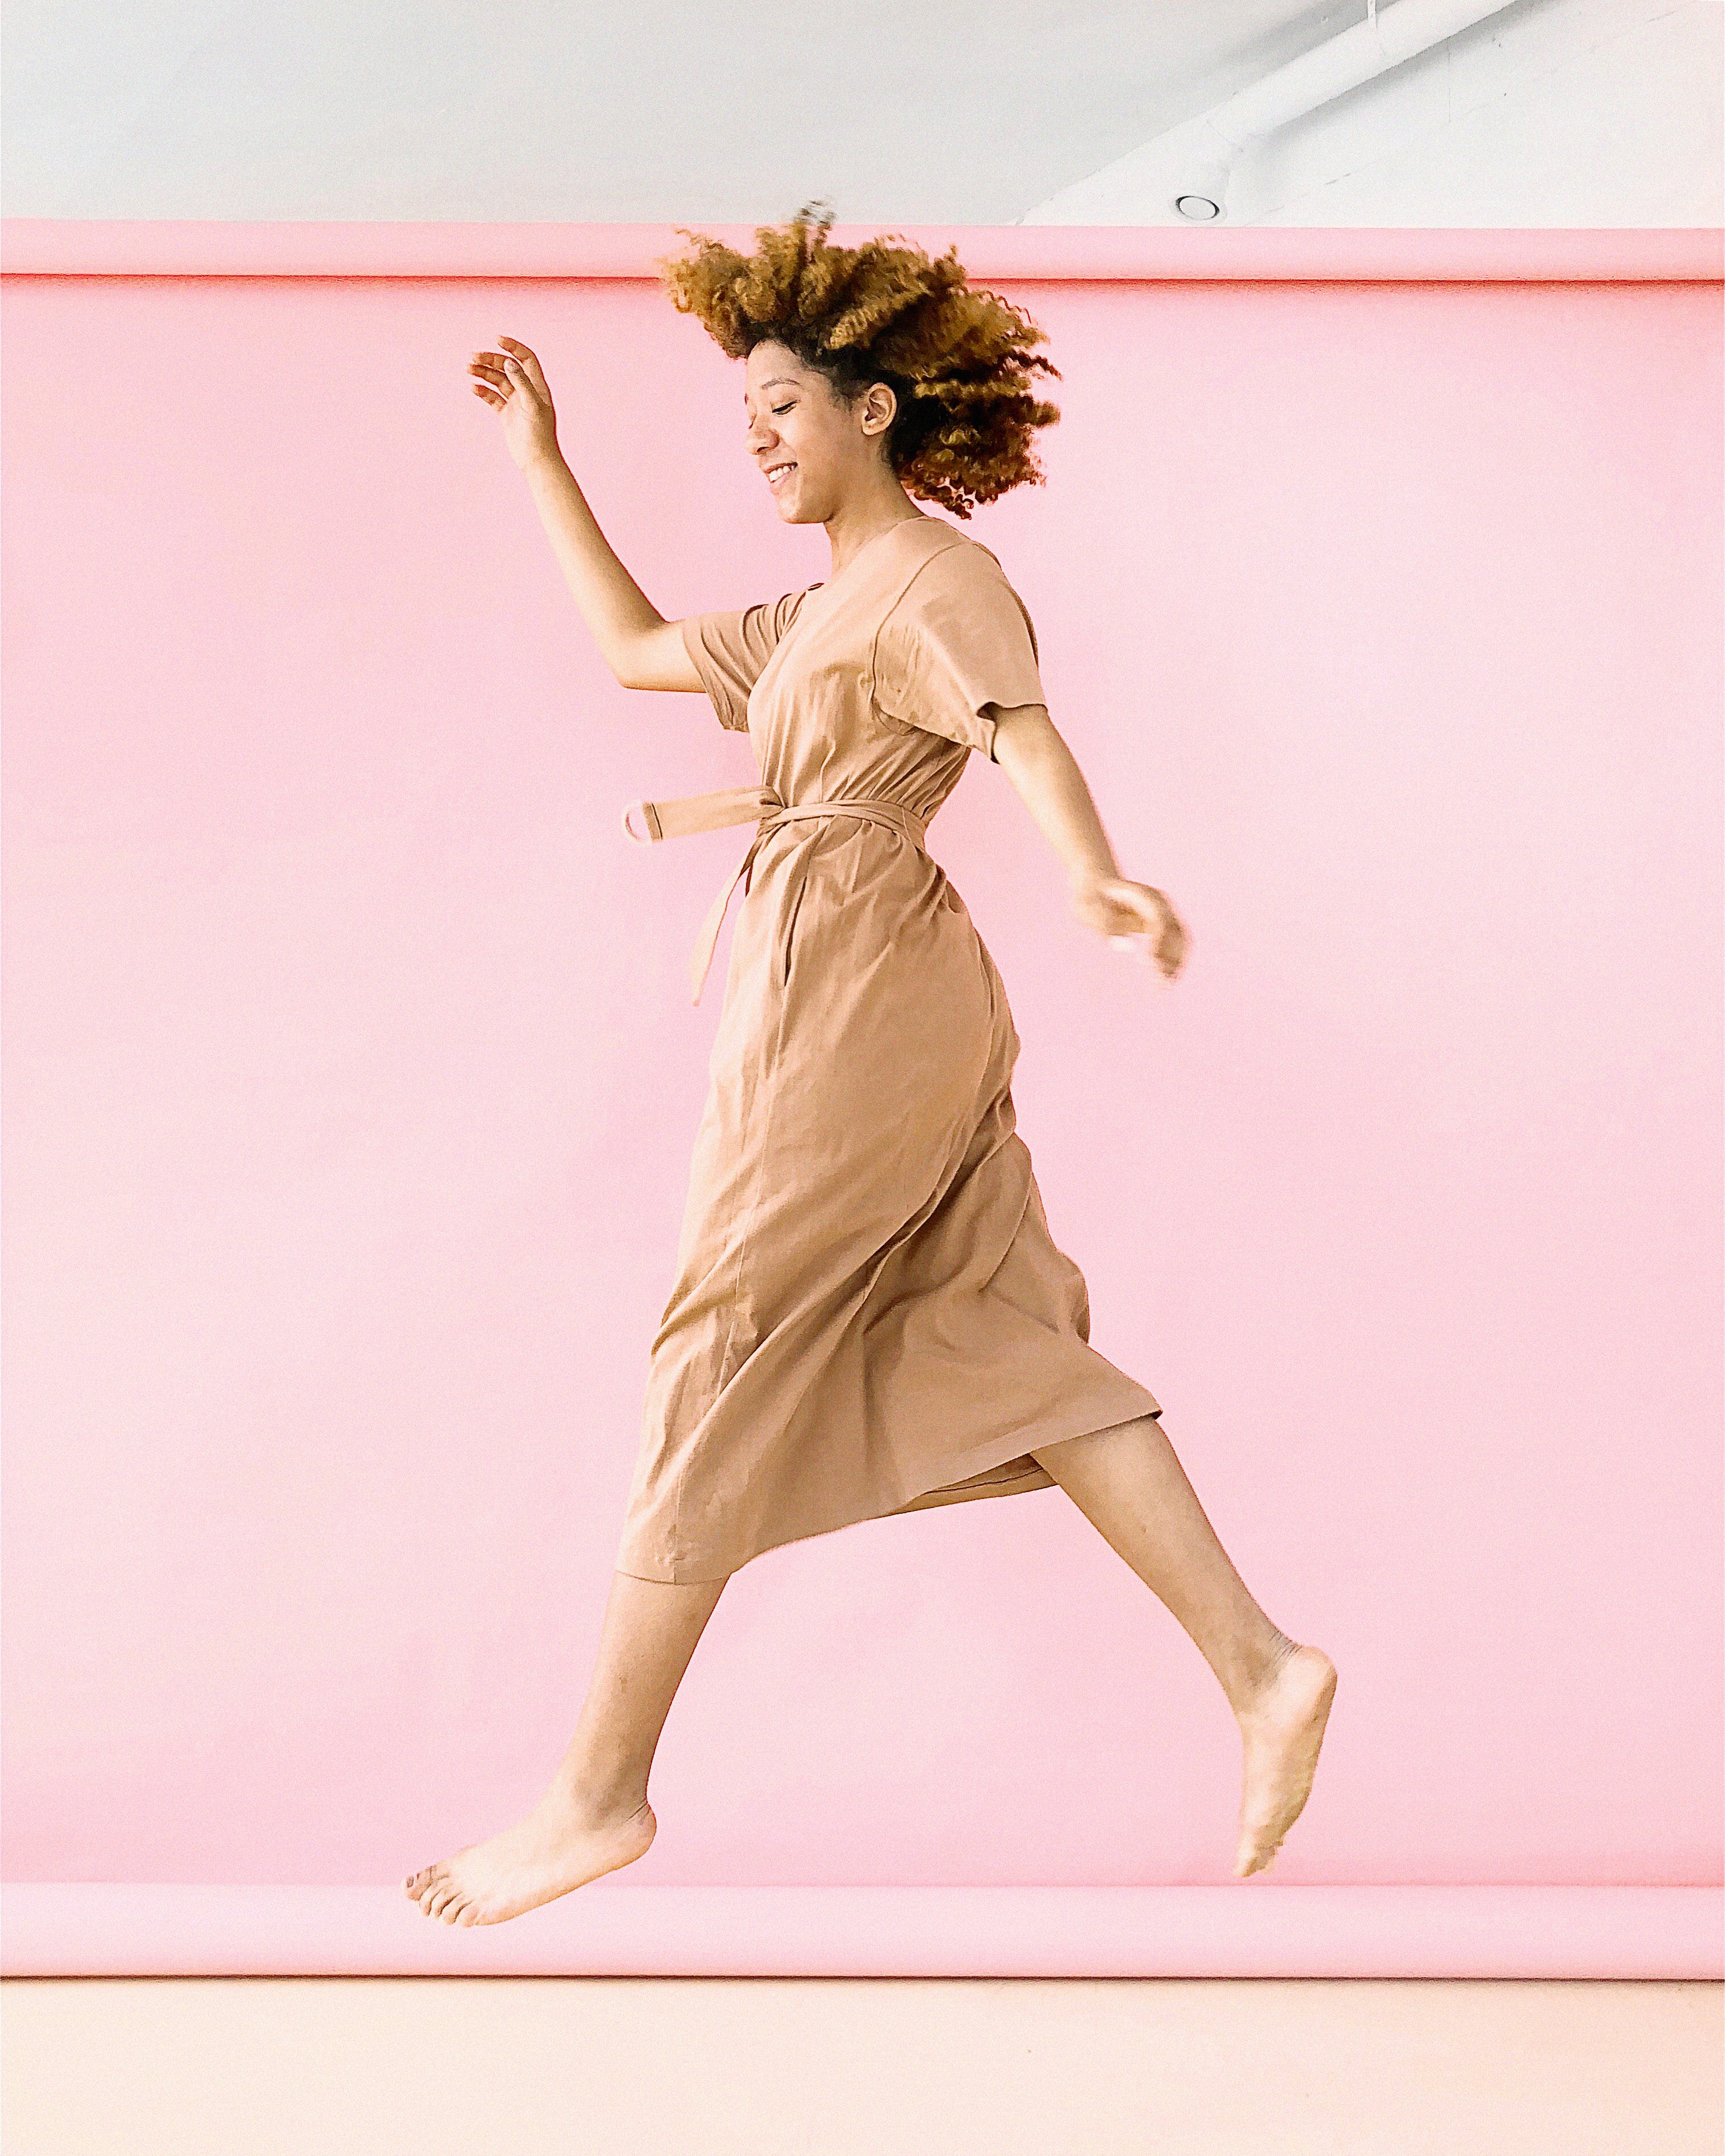 Woman Wearing Brown Dress Jump Near Pink Wall